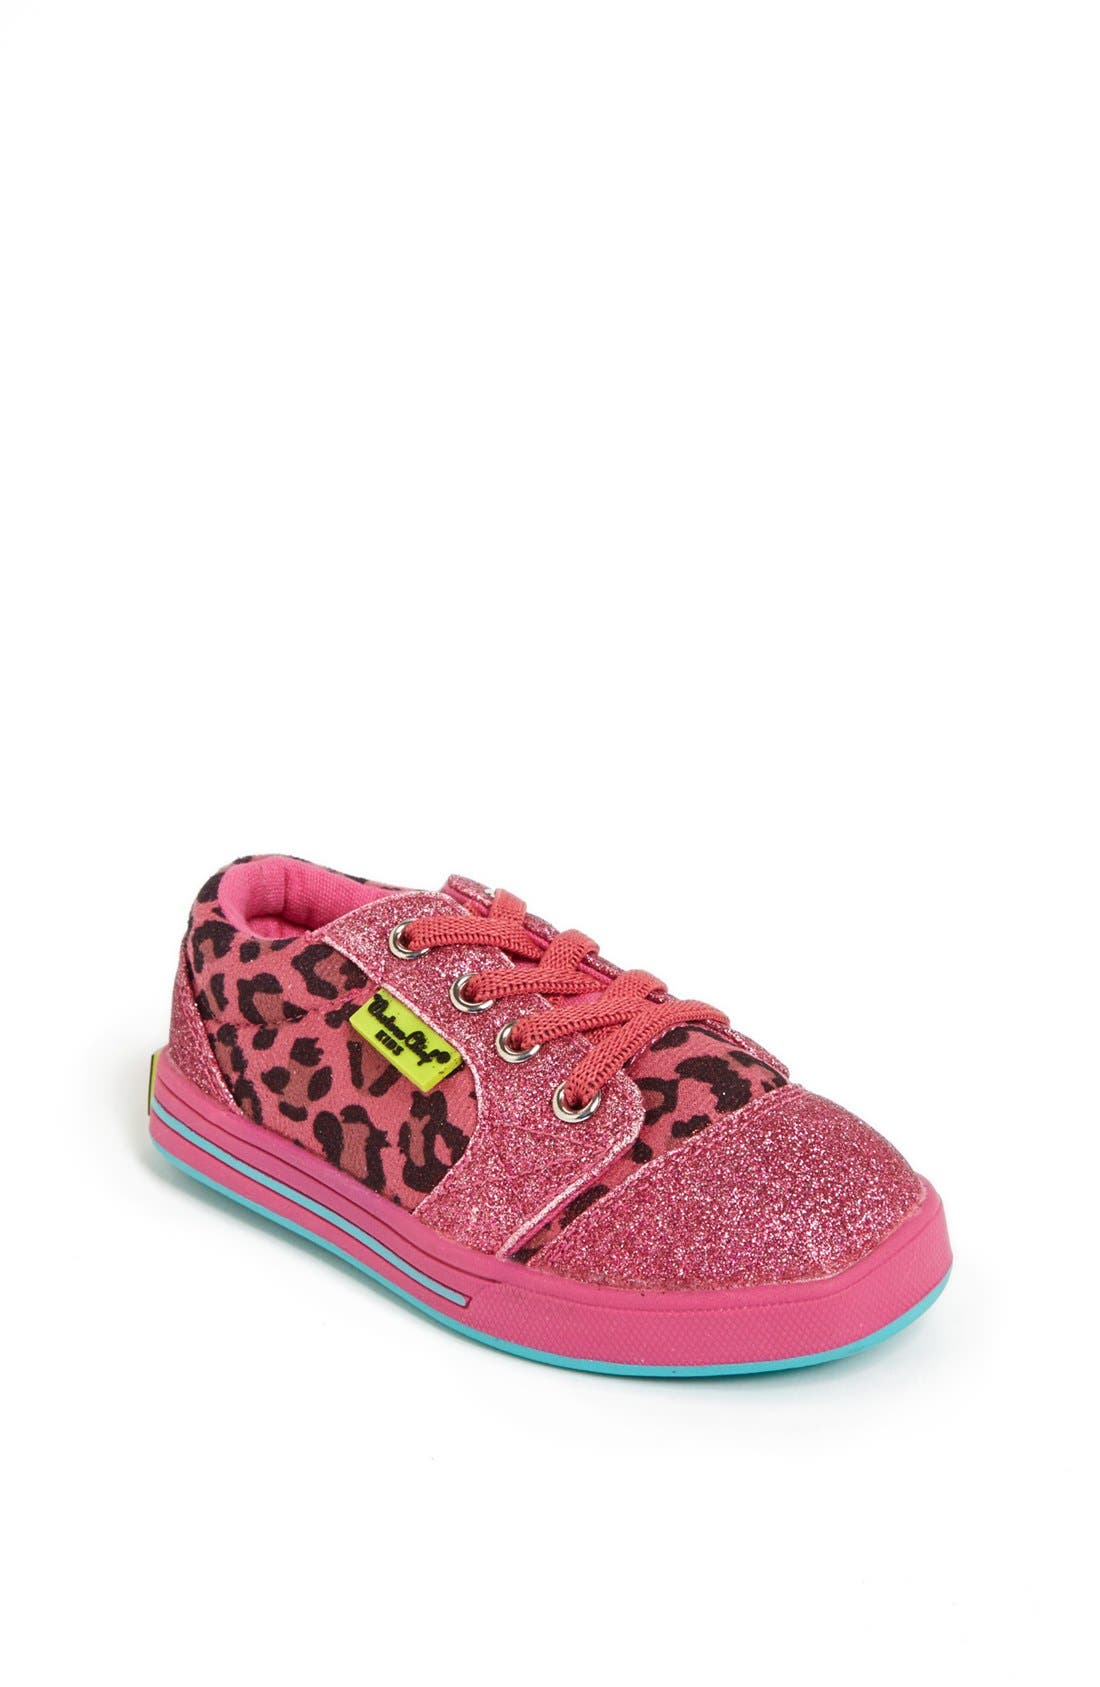 Alternate Image 1 Selected - Western Chief 'Flashy Leopard' Sneaker (Walker & Toddler)